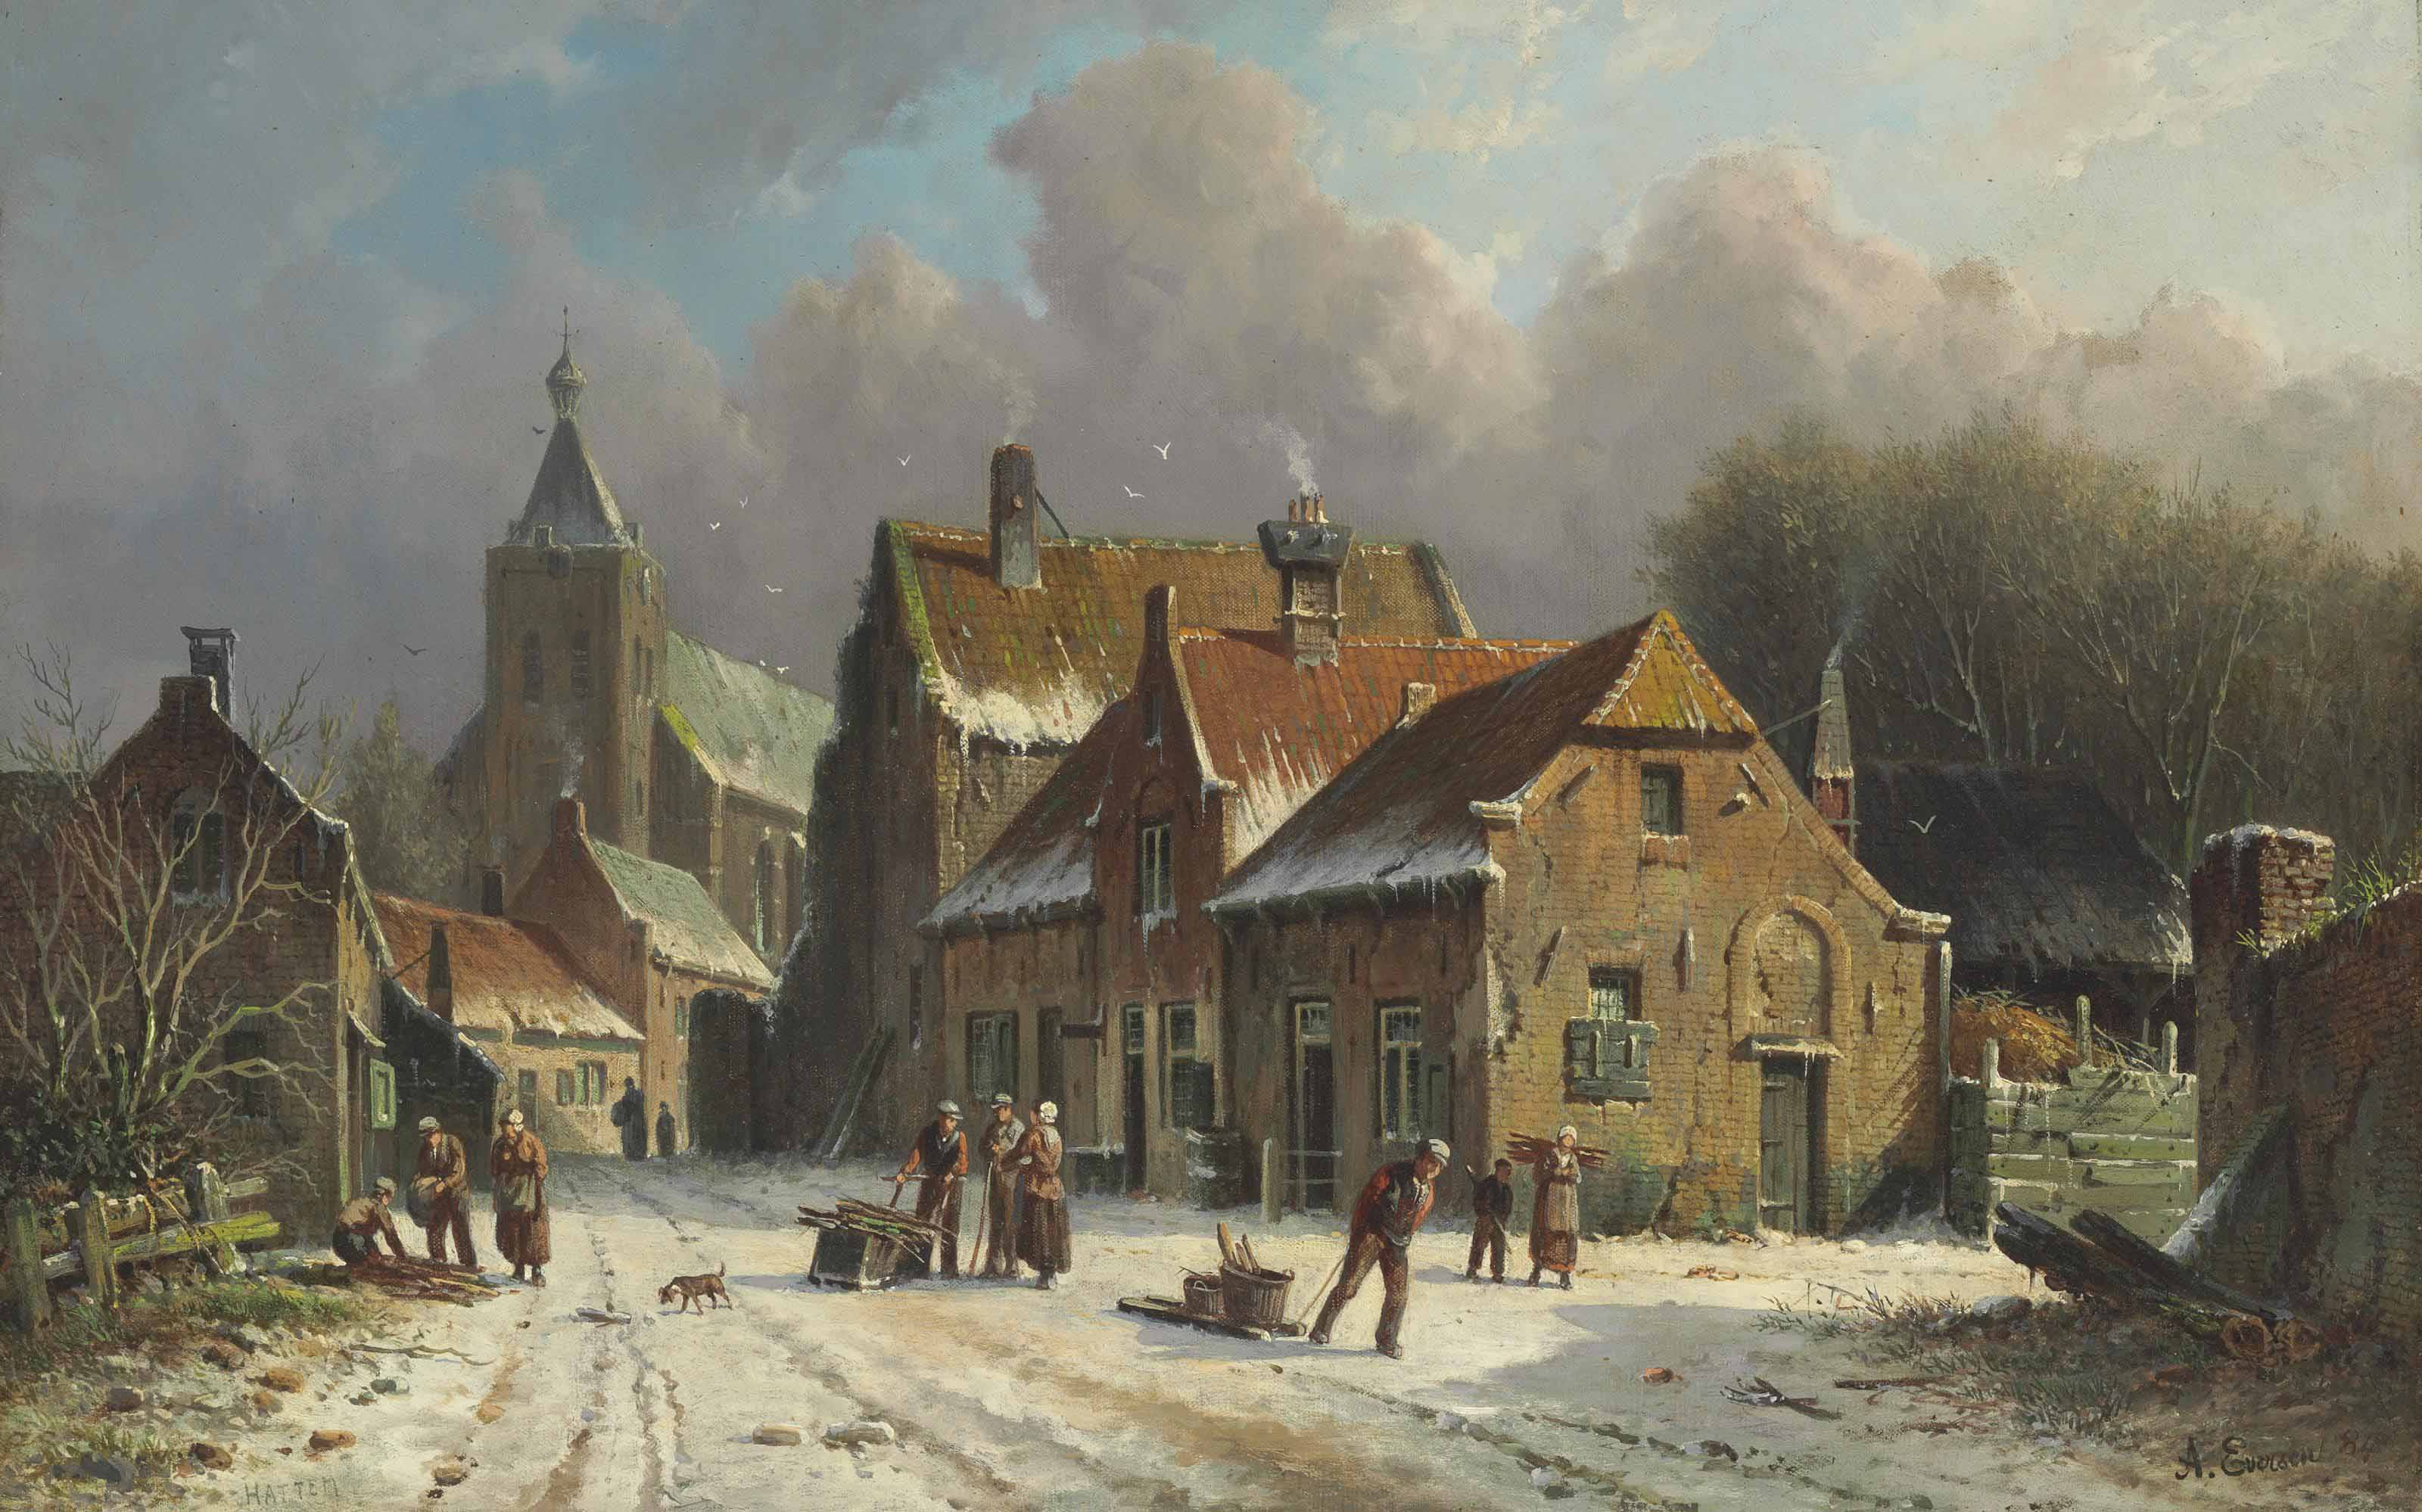 Adrianus Eversen (Dutch, 1897-